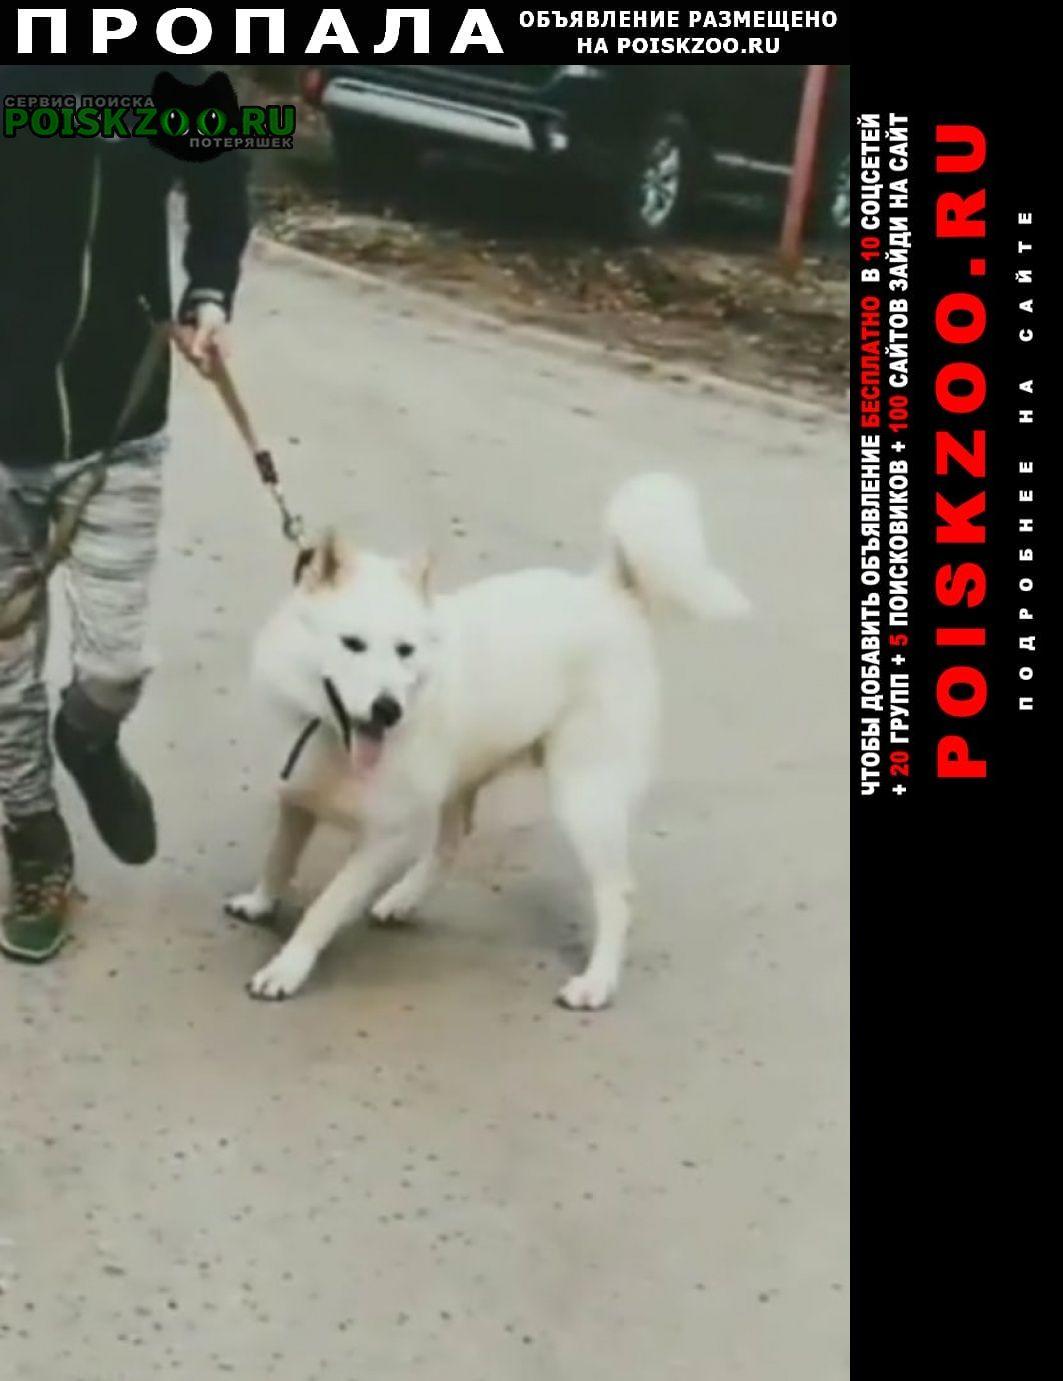 Пропала собака белая лайка Йошкар-Ола